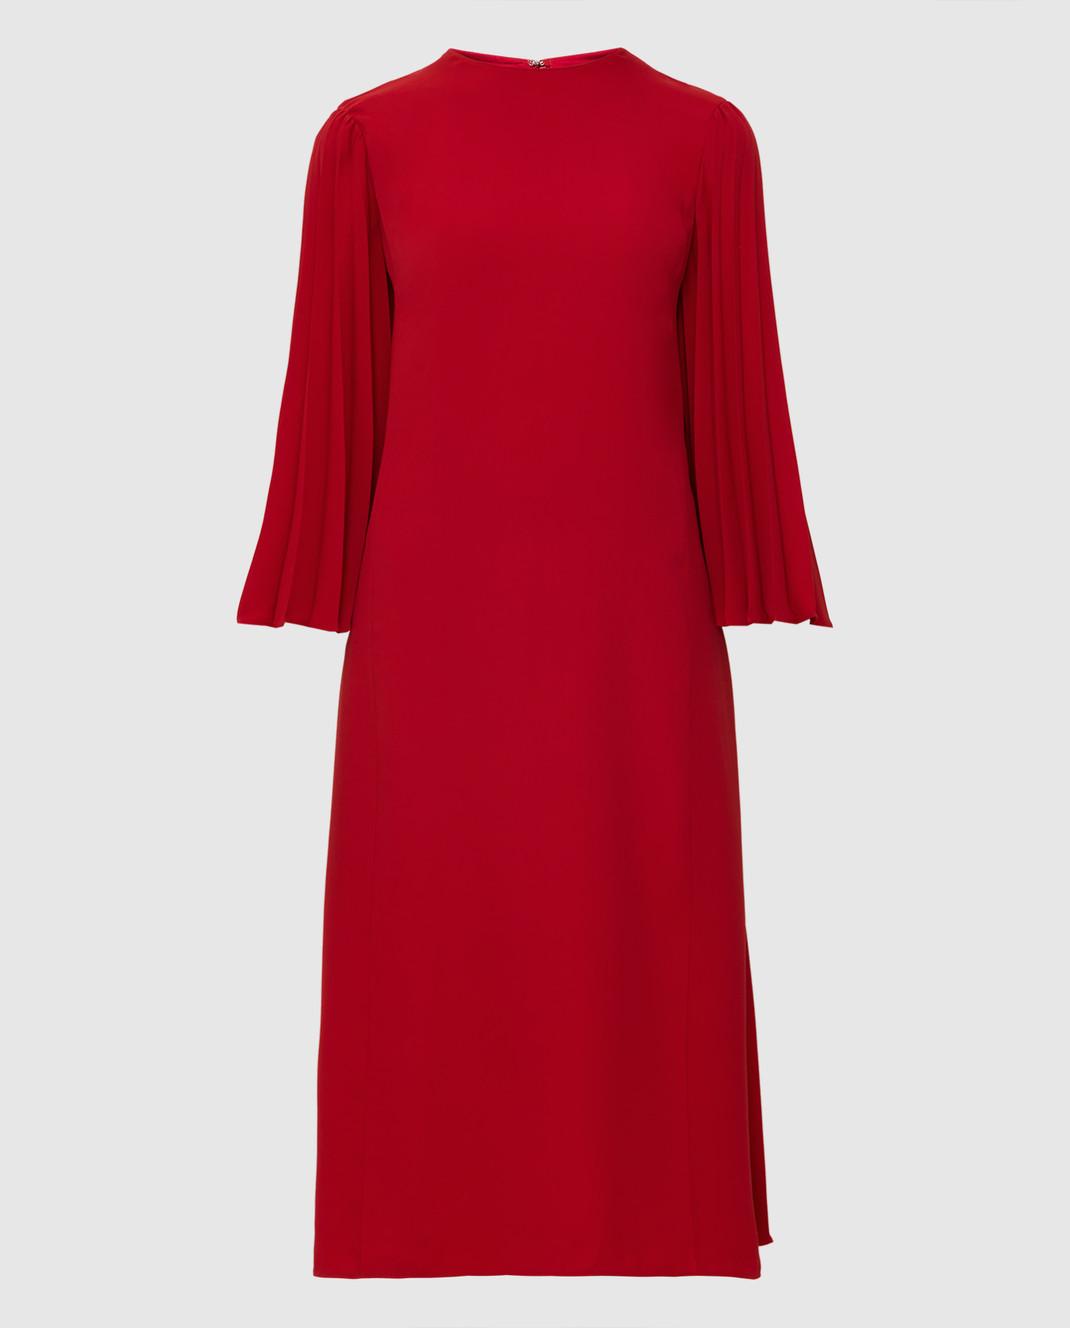 Valentino Красное платье SB3VAN104NK